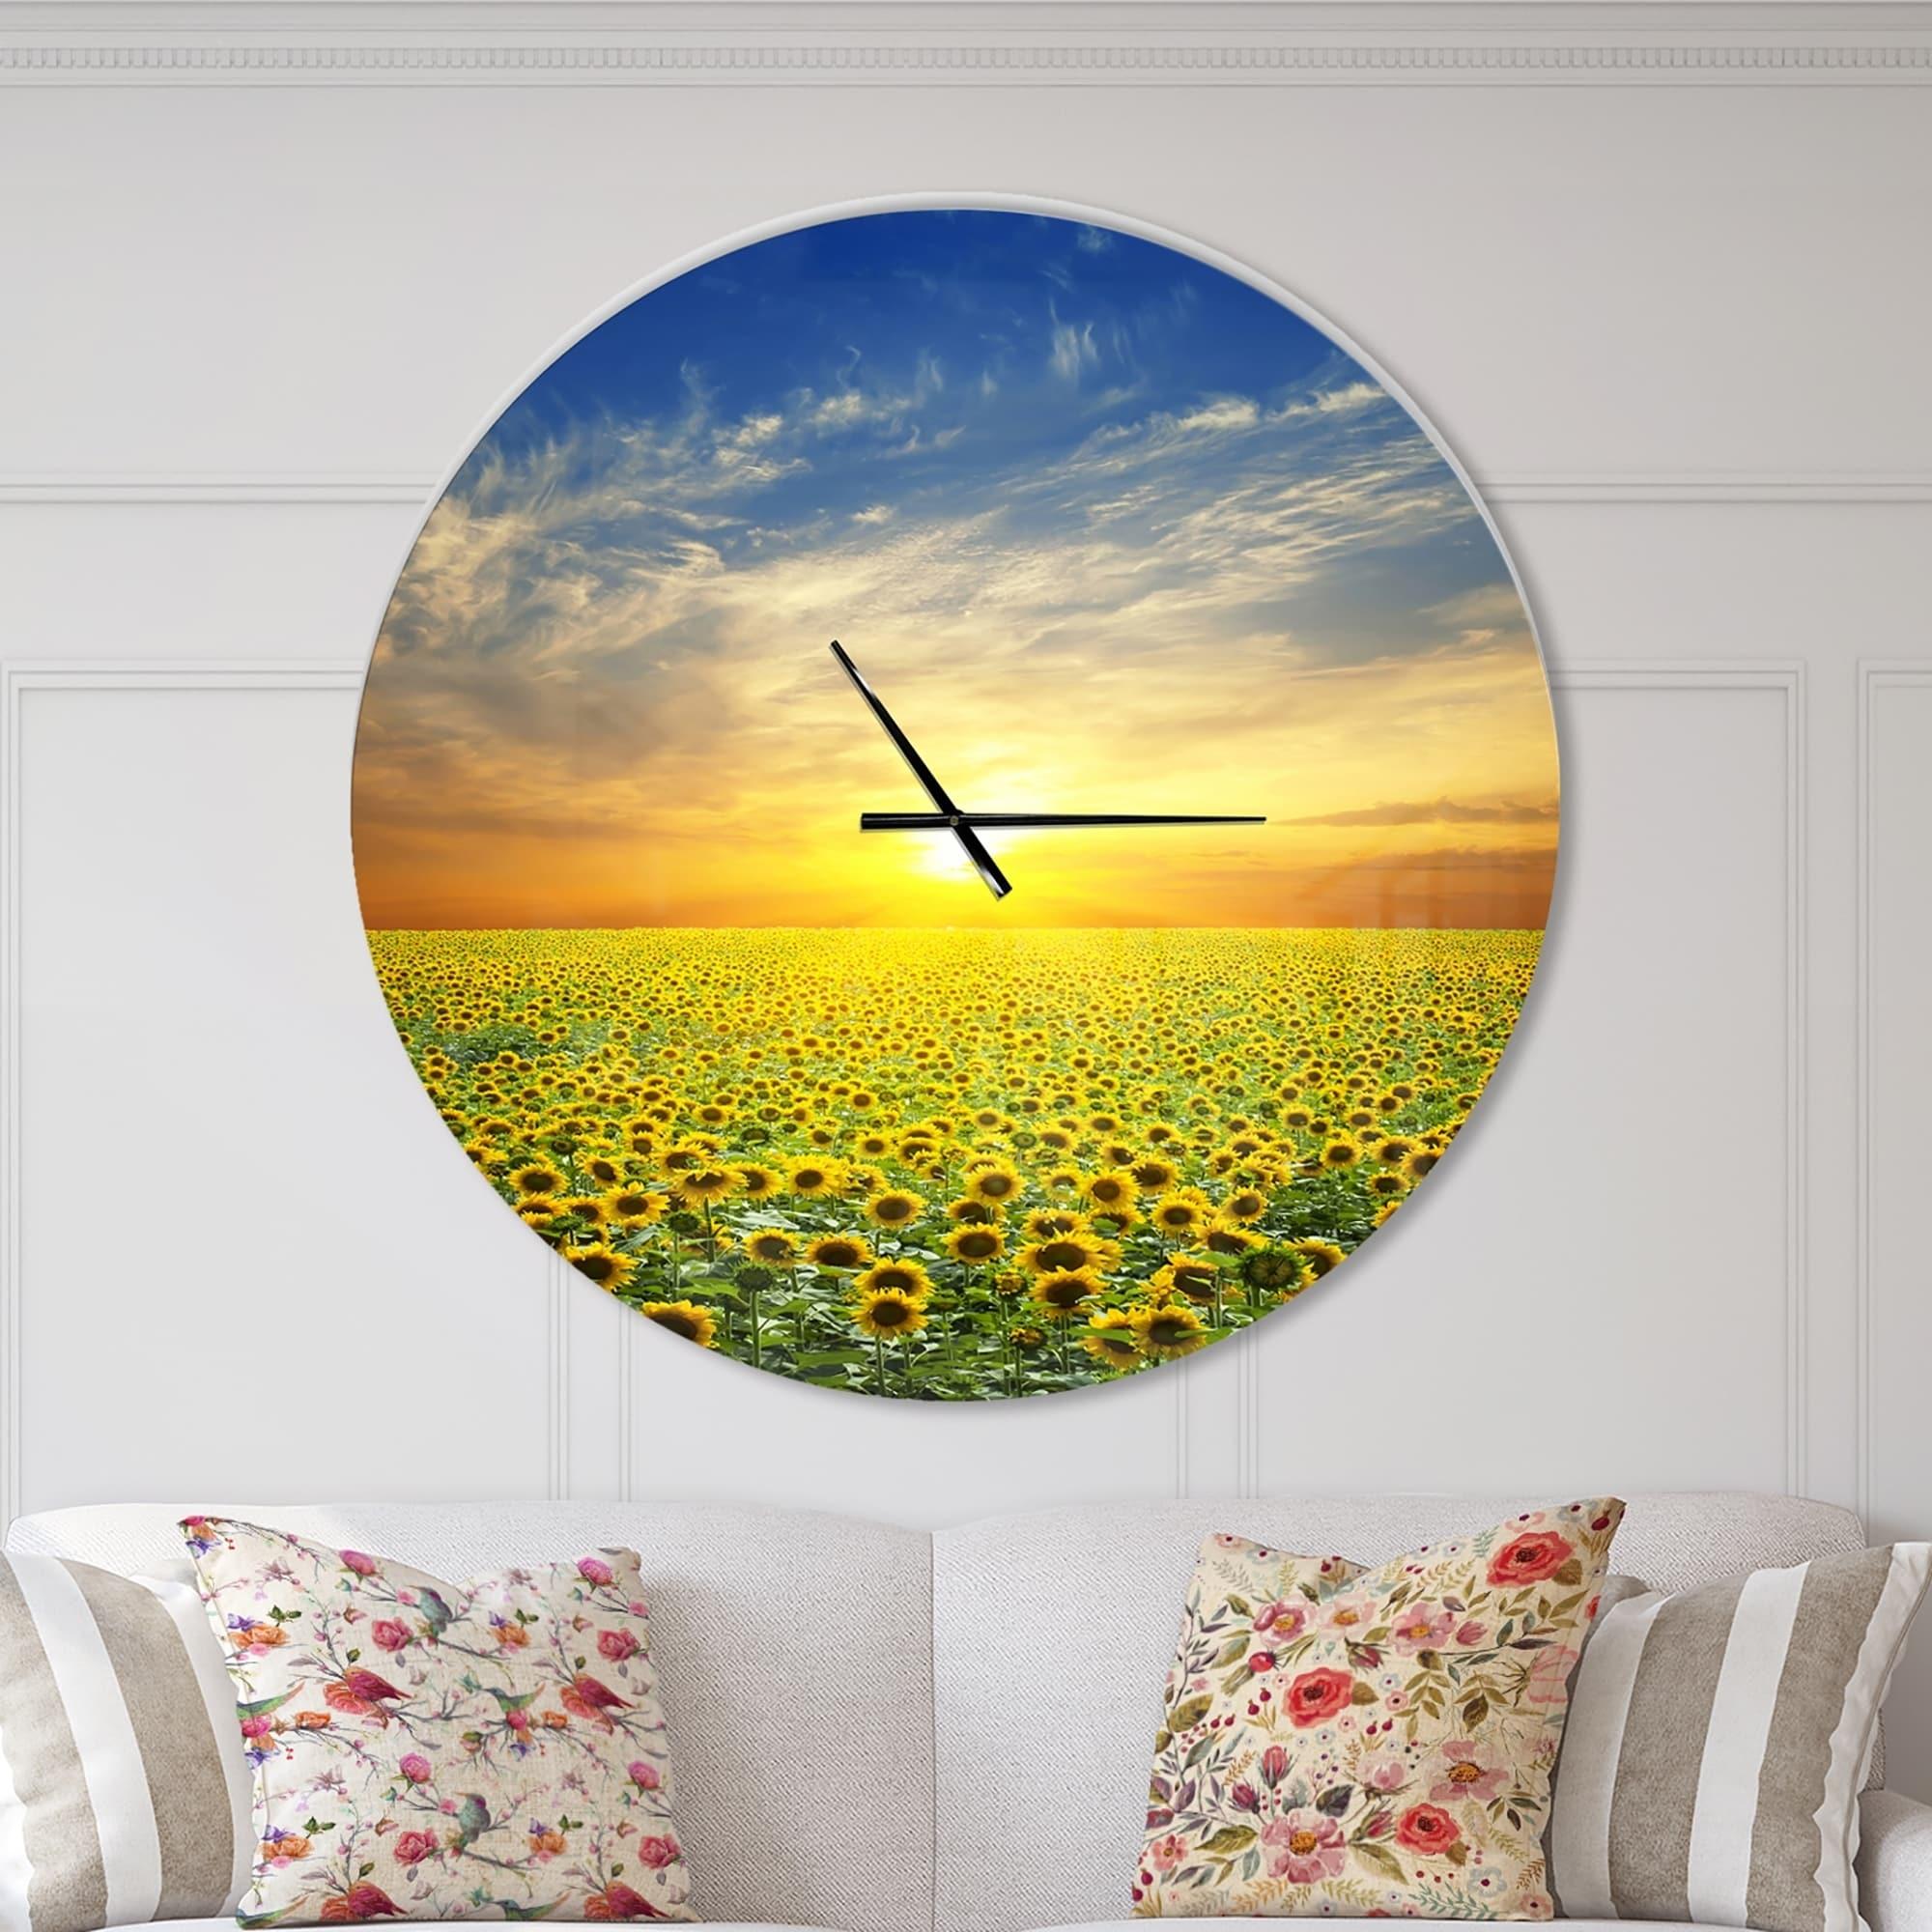 Designart Beauty Sunset Over Sunflowers Field Oversized Floral Wall Clock On Sale Overstock 23534862